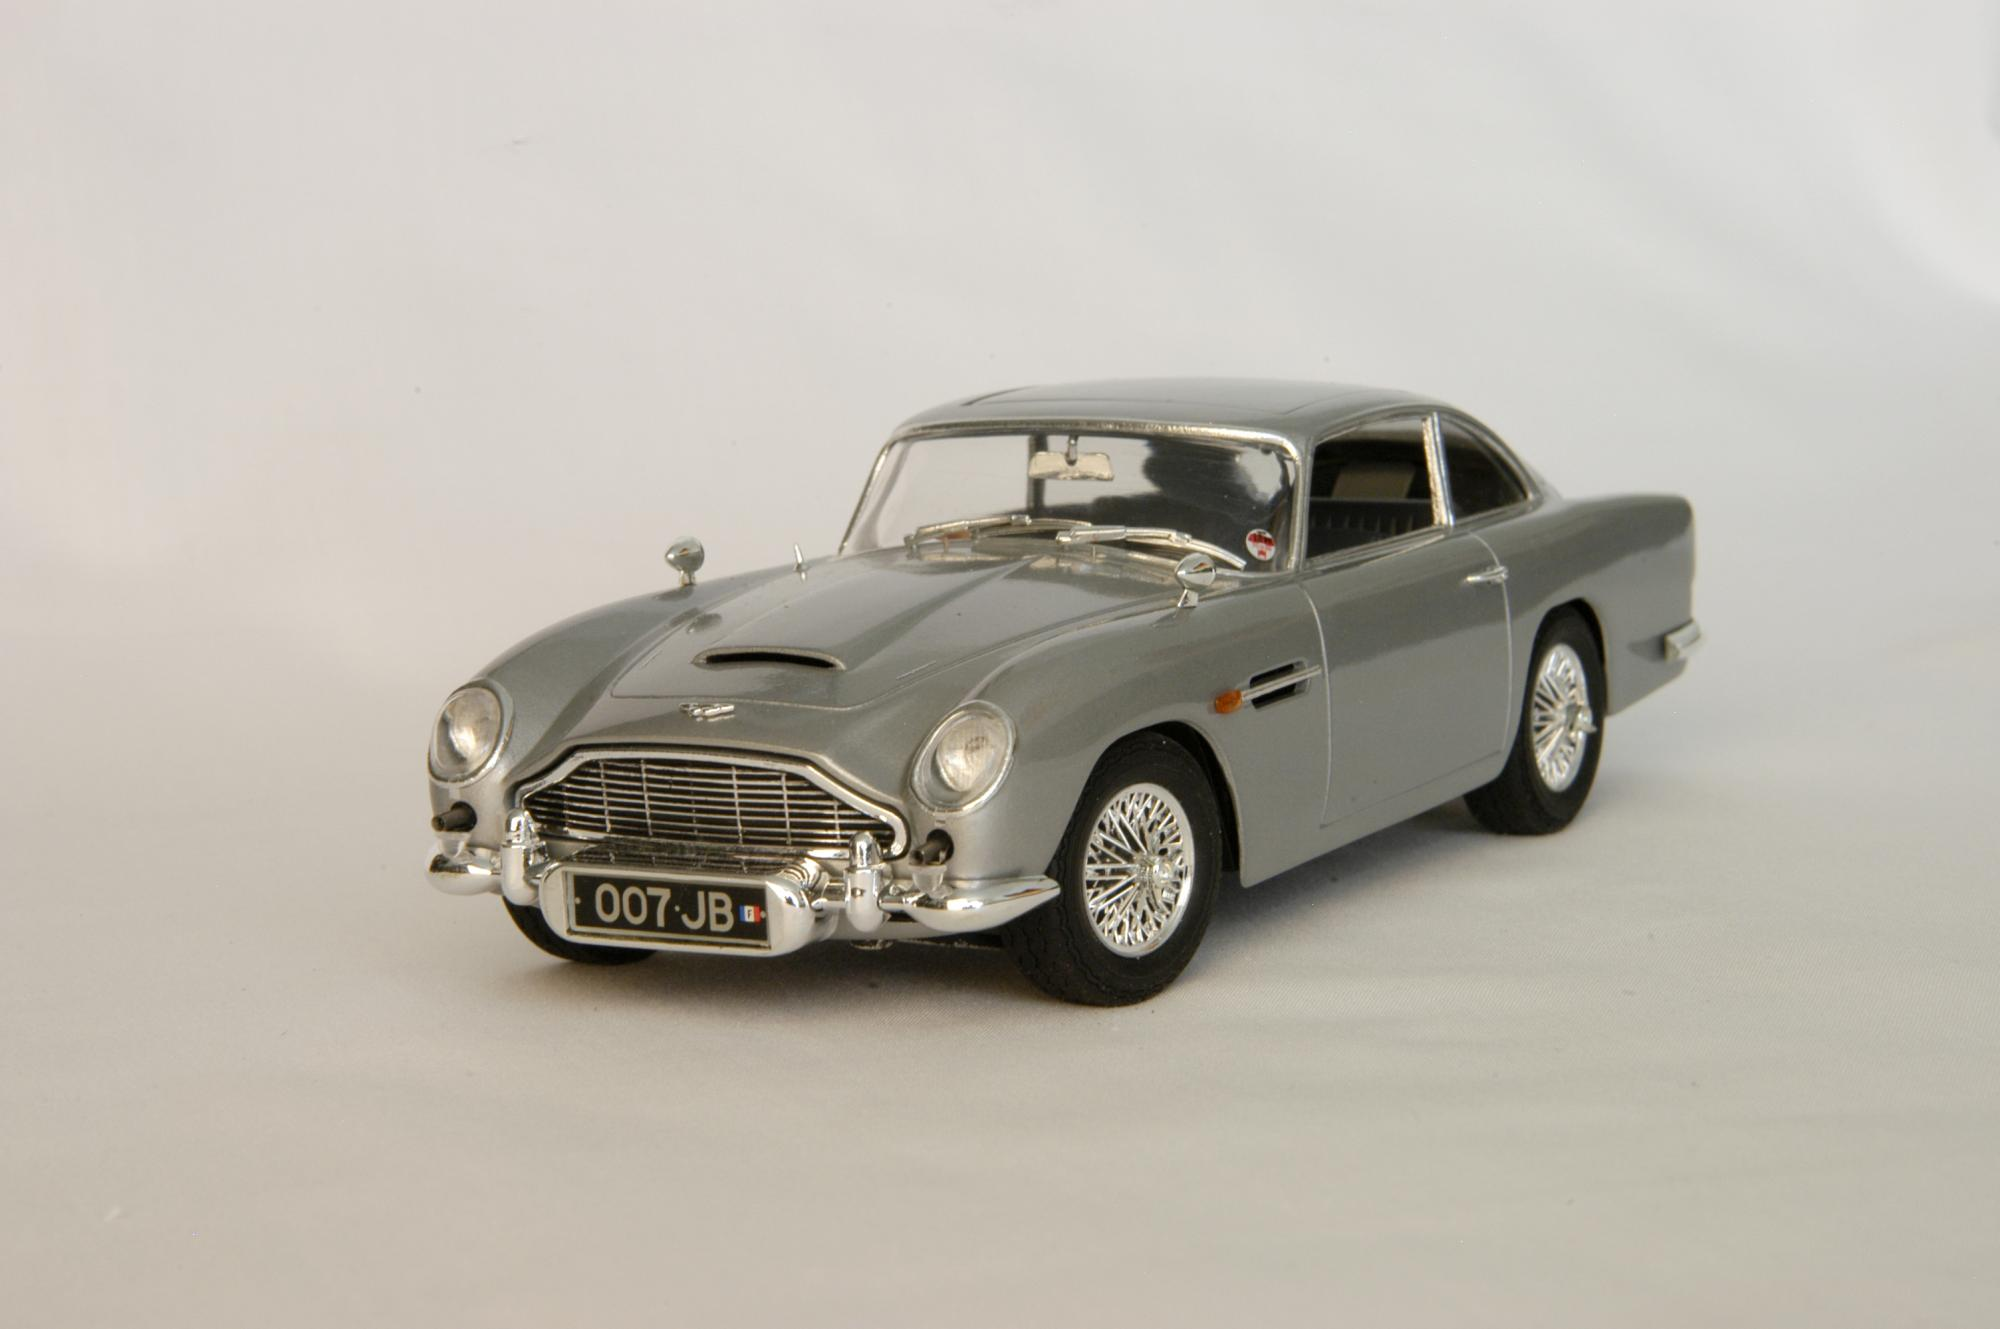 james bond aston martin db5 under glass model cars magazine forum. Black Bedroom Furniture Sets. Home Design Ideas